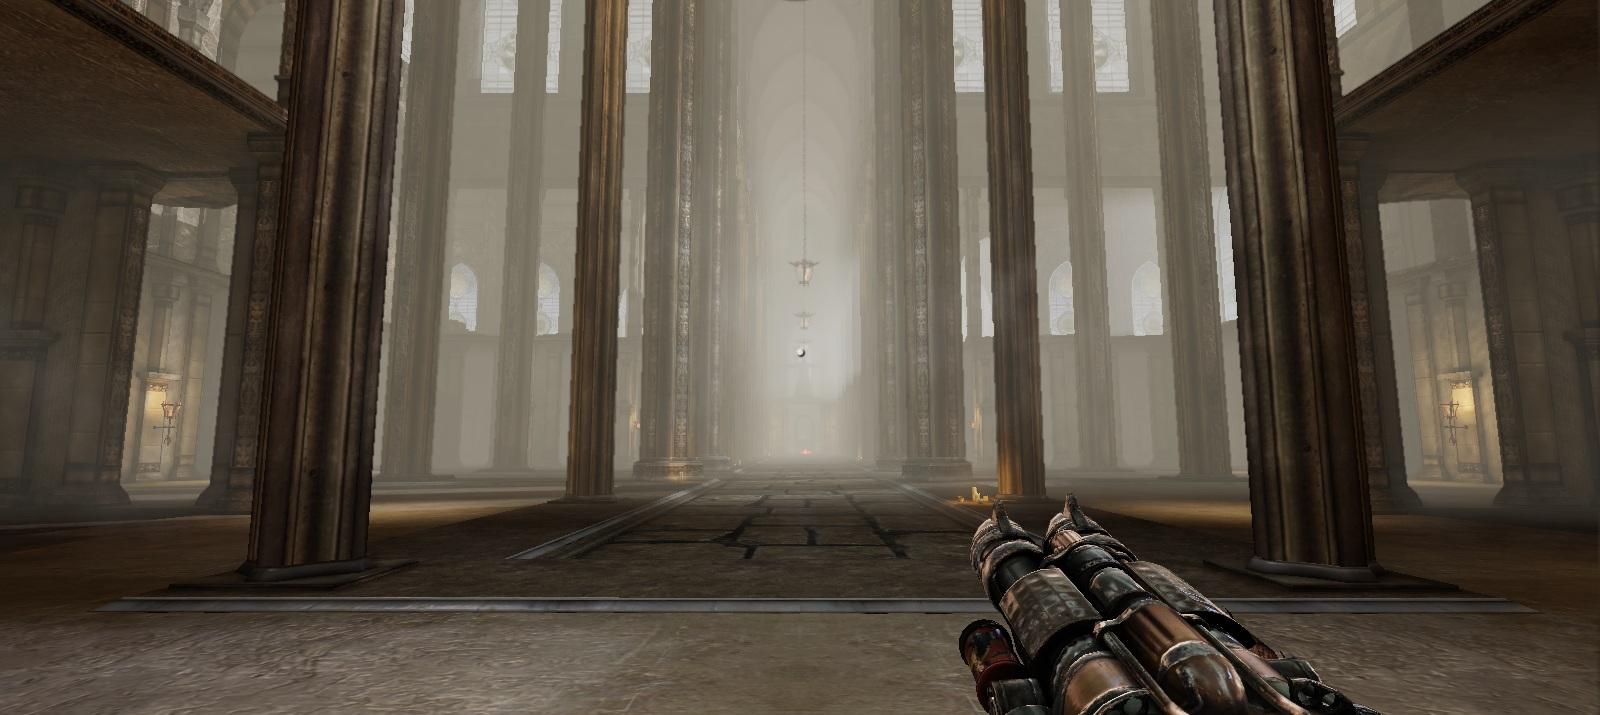 2. Katedrála